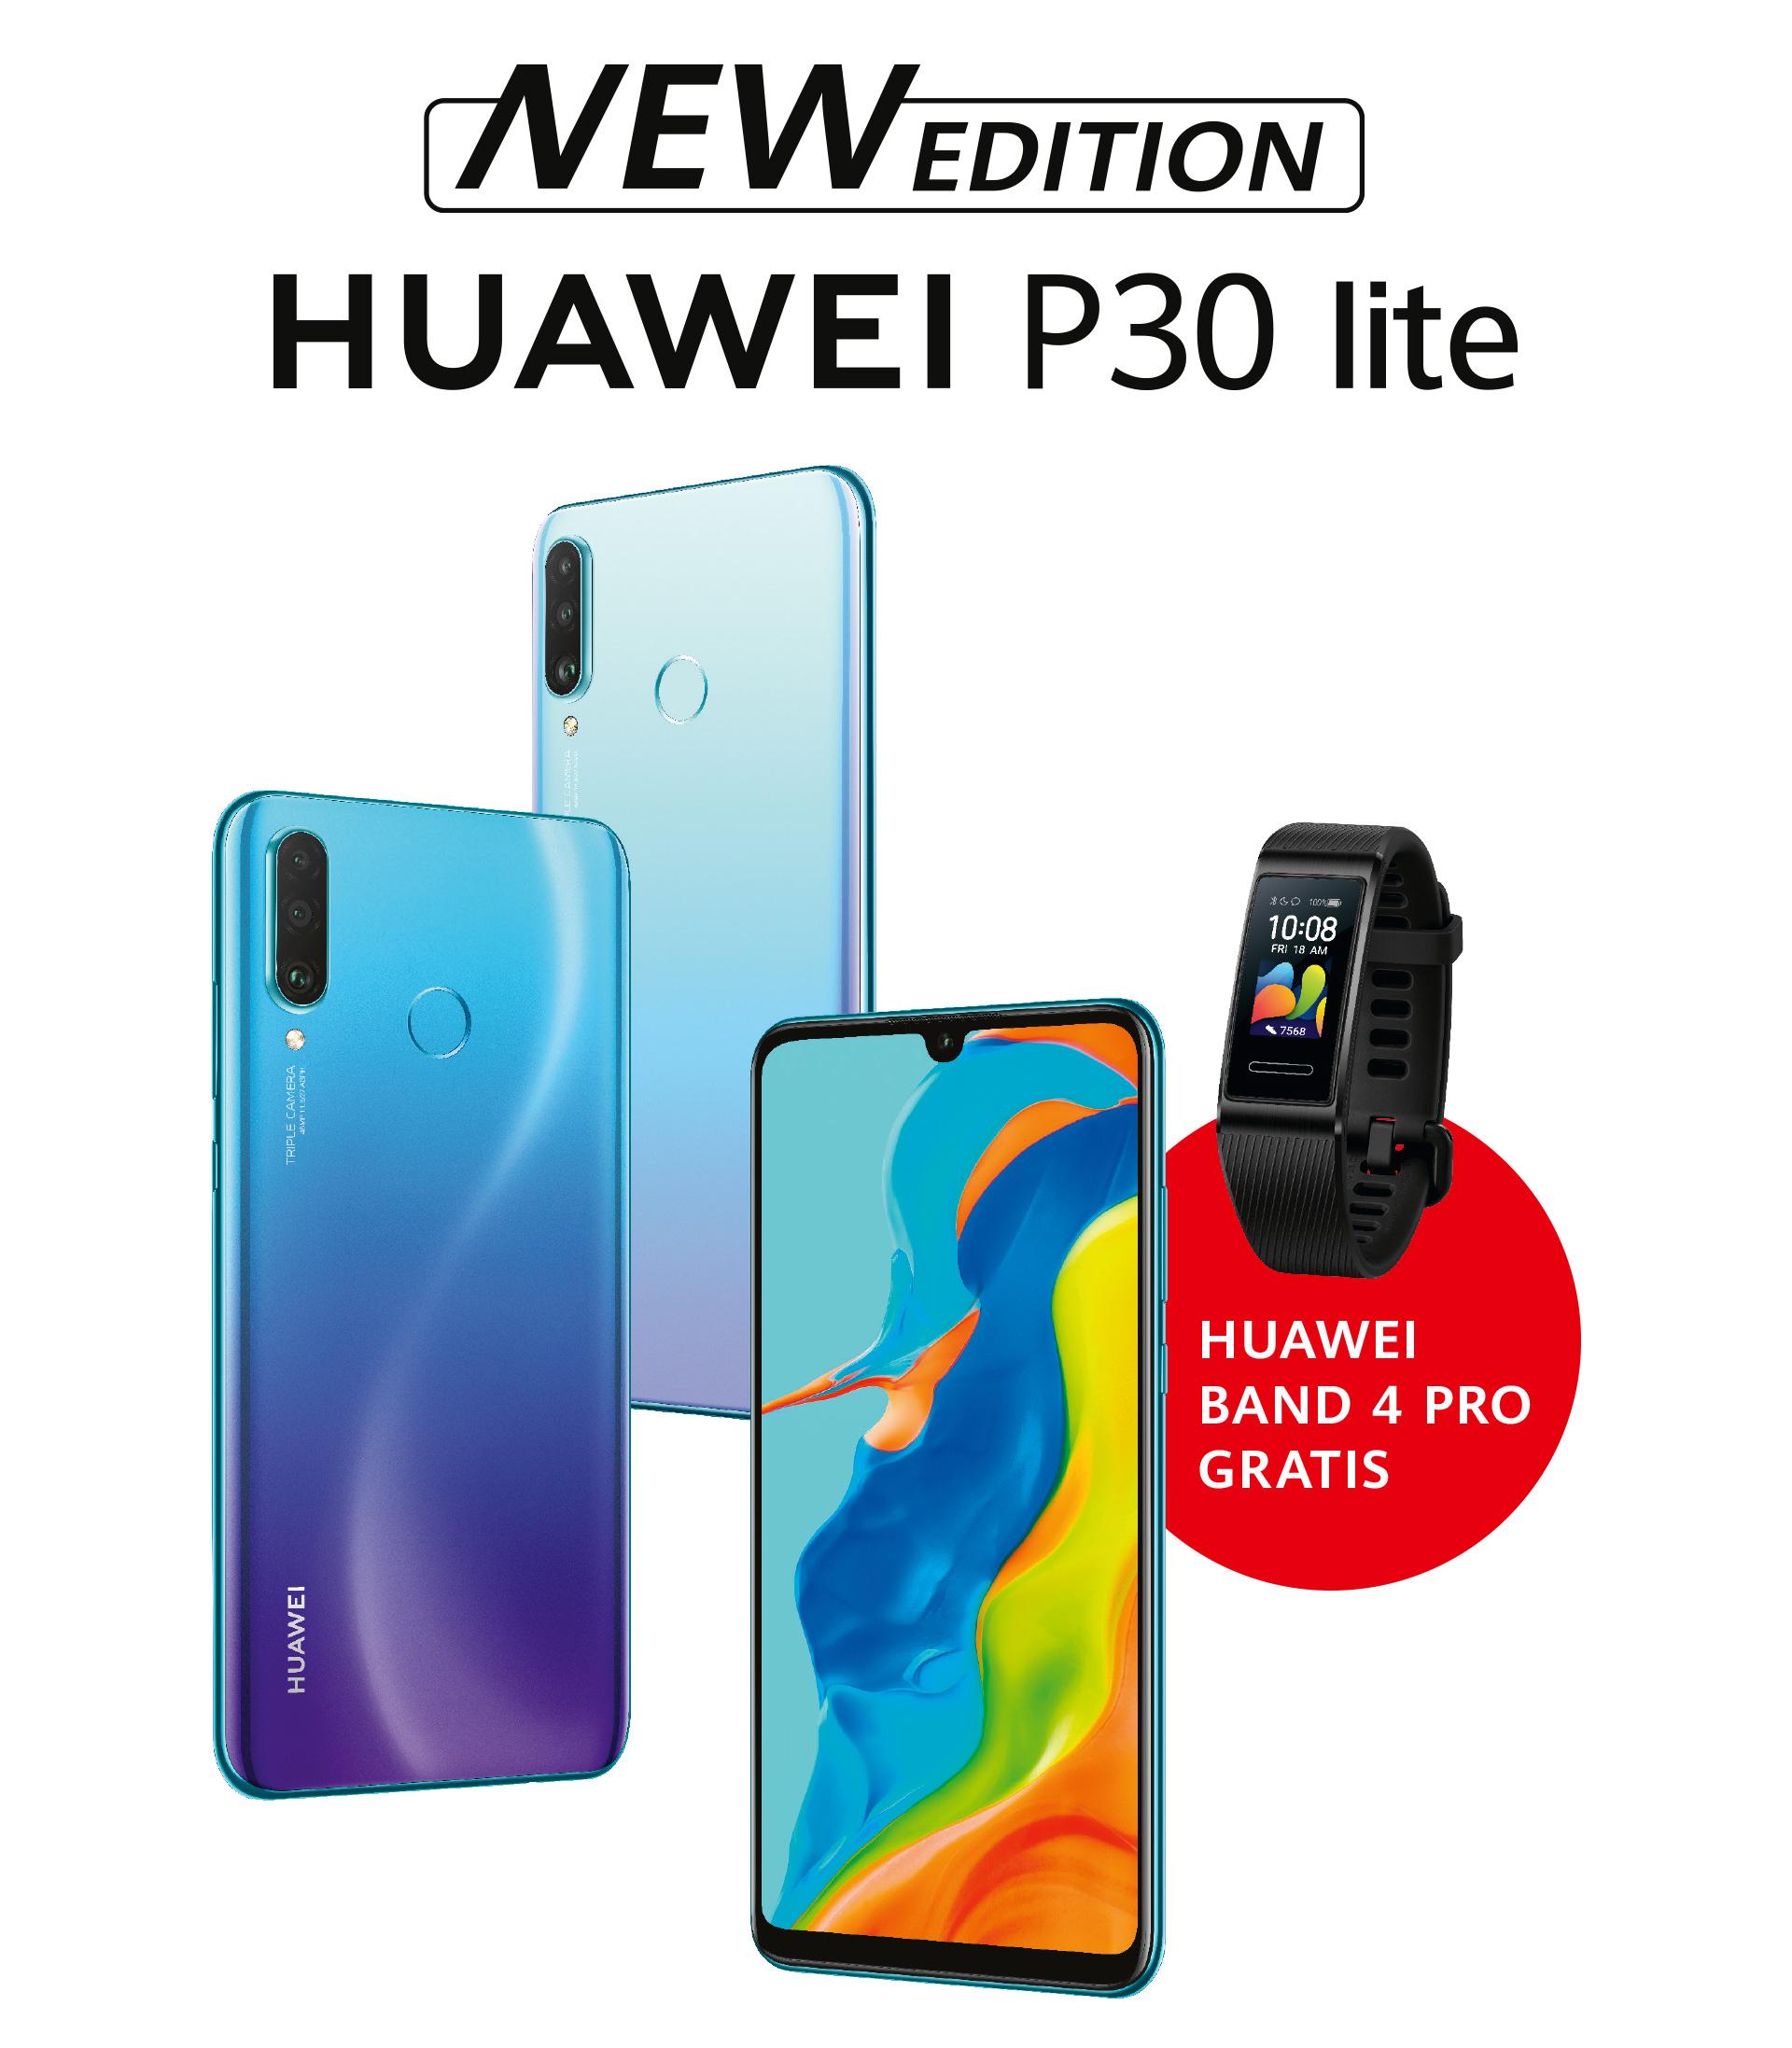 Huawei P30 Lite (New Edition) incl. gratis HUAWEI Band 4 Pro(Wert ca. 57€)